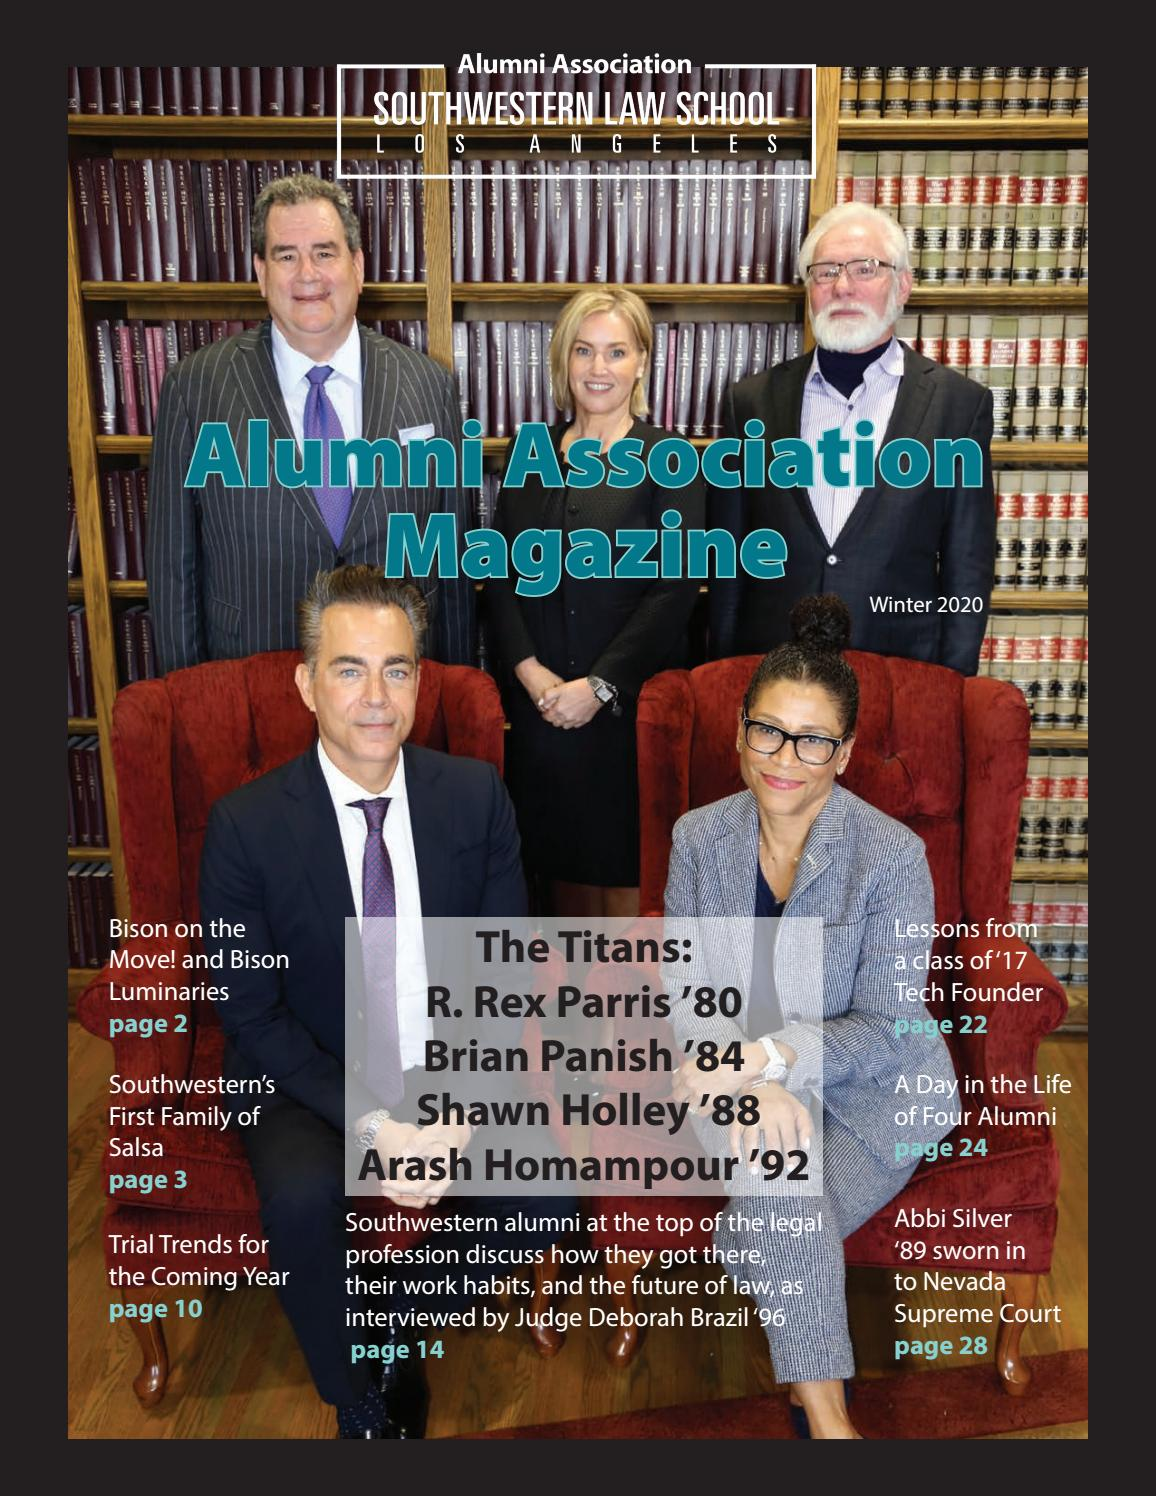 Alumni association magazine